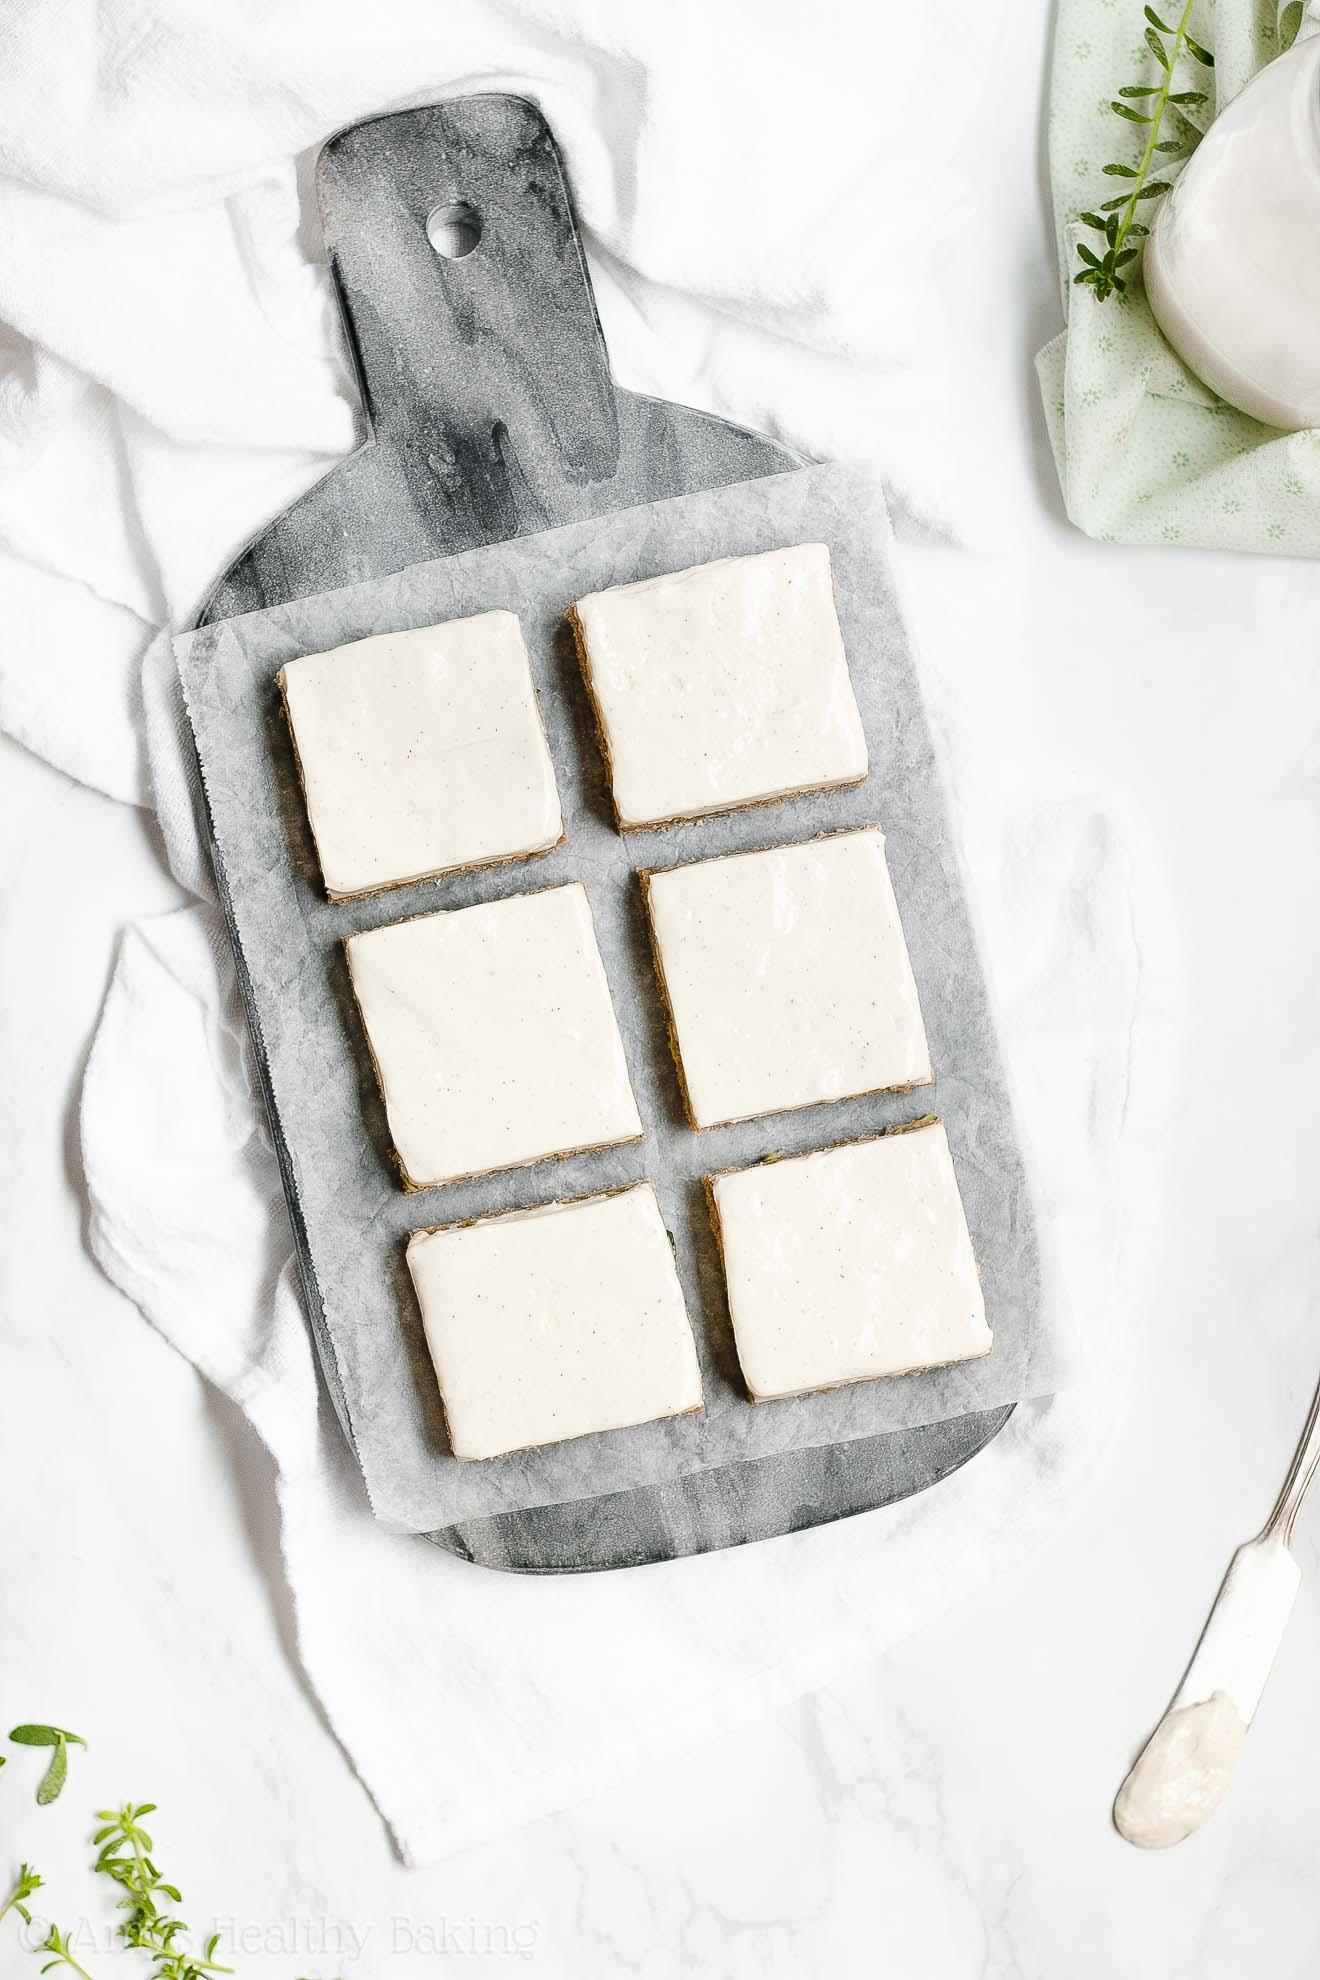 Healthy Zucchini Cookie Bars with Greek Yogurt Cream Cheese Frosting